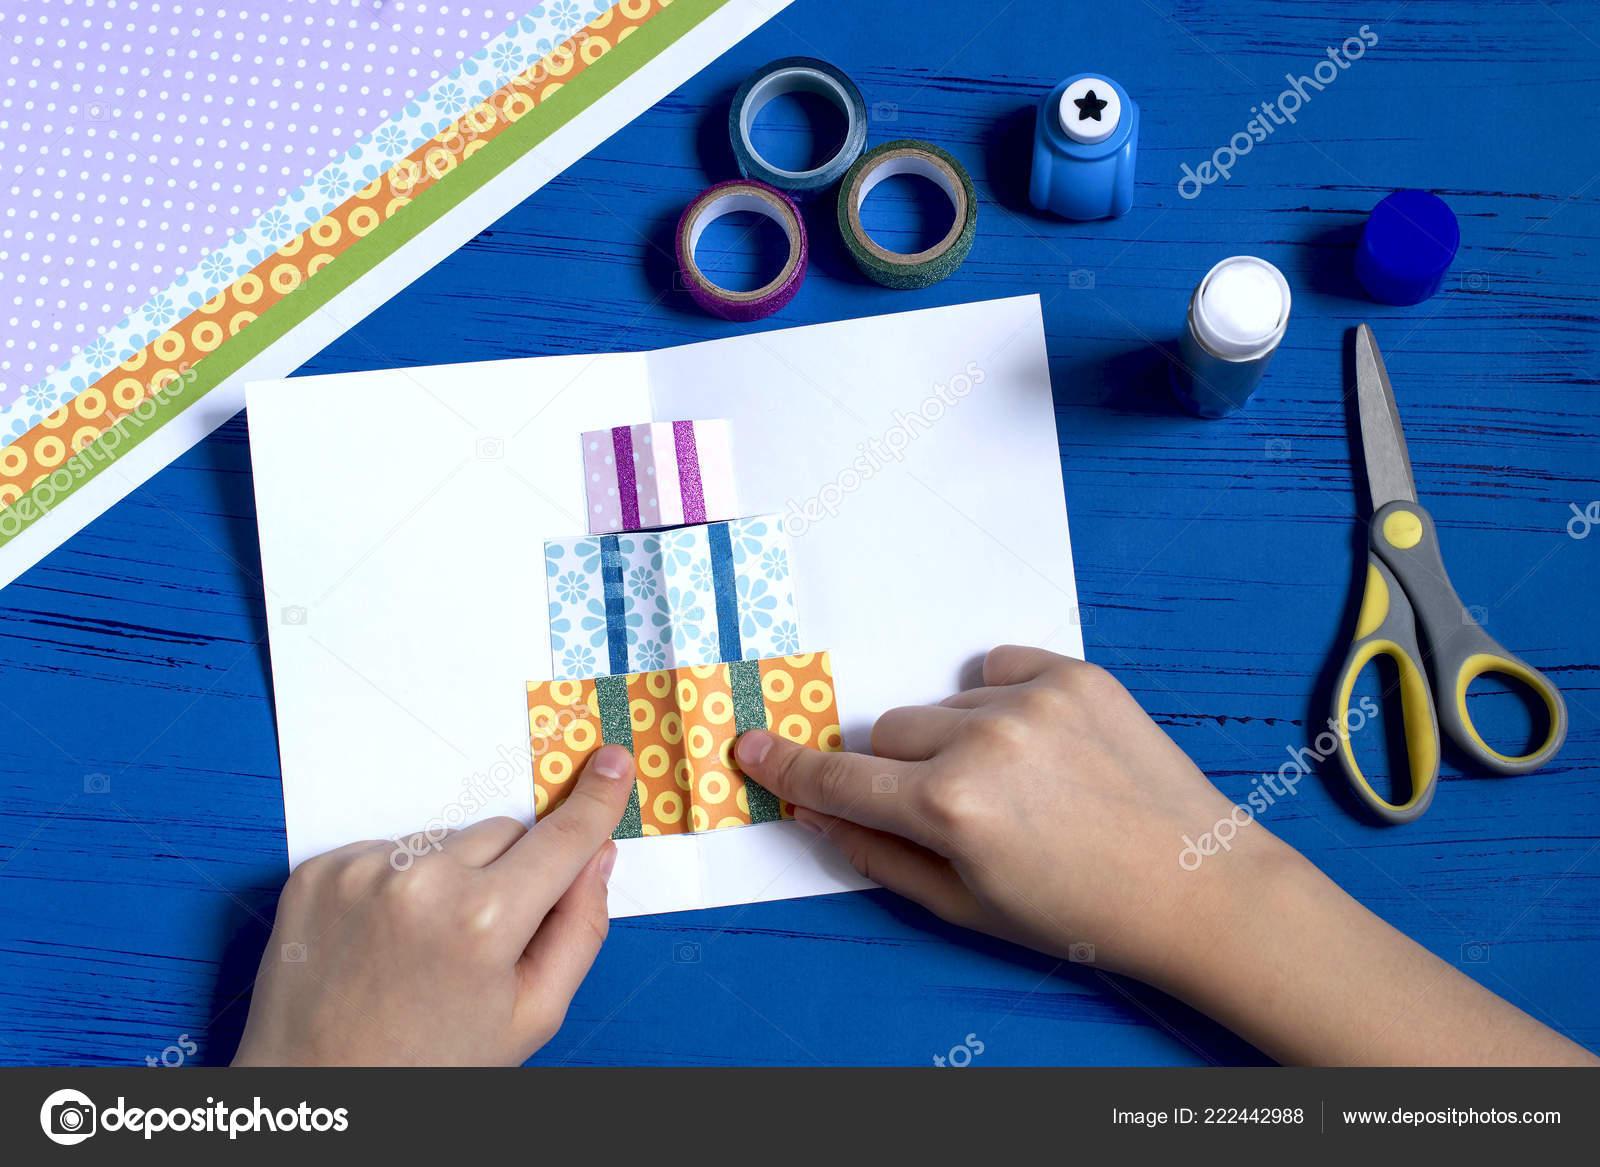 depositphotos stock photo child makes card ts christmas